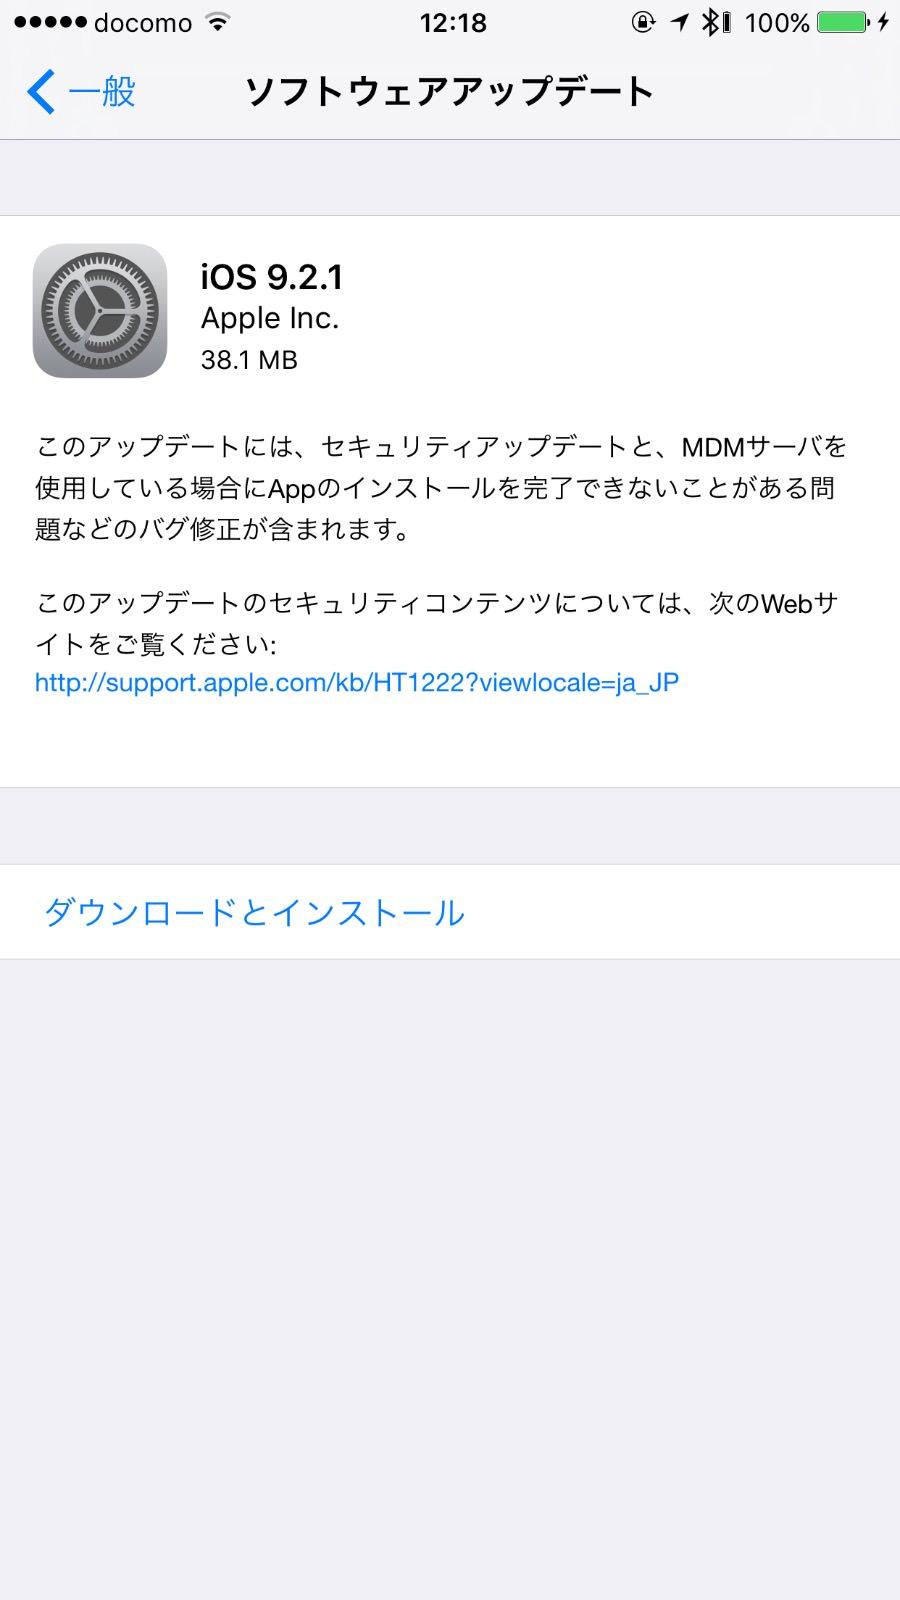 【iOS】「iOS 9.2.1」リリース → 不具合の修正とセキュリティアップデート